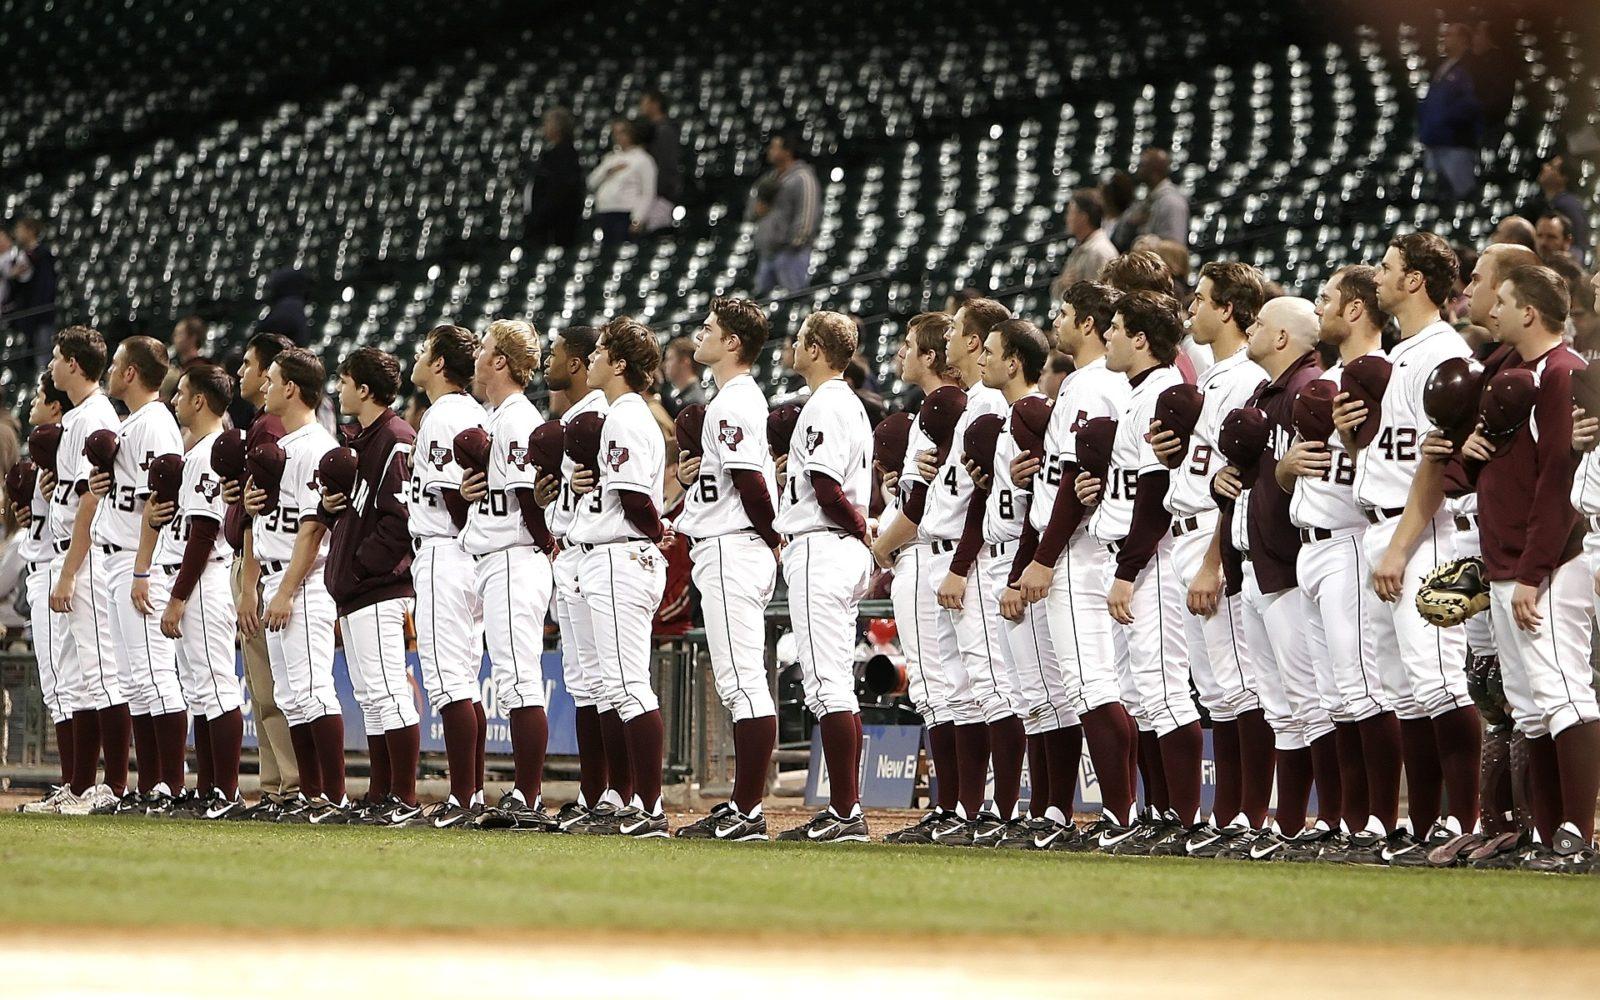 baseball-team-1529403_1920